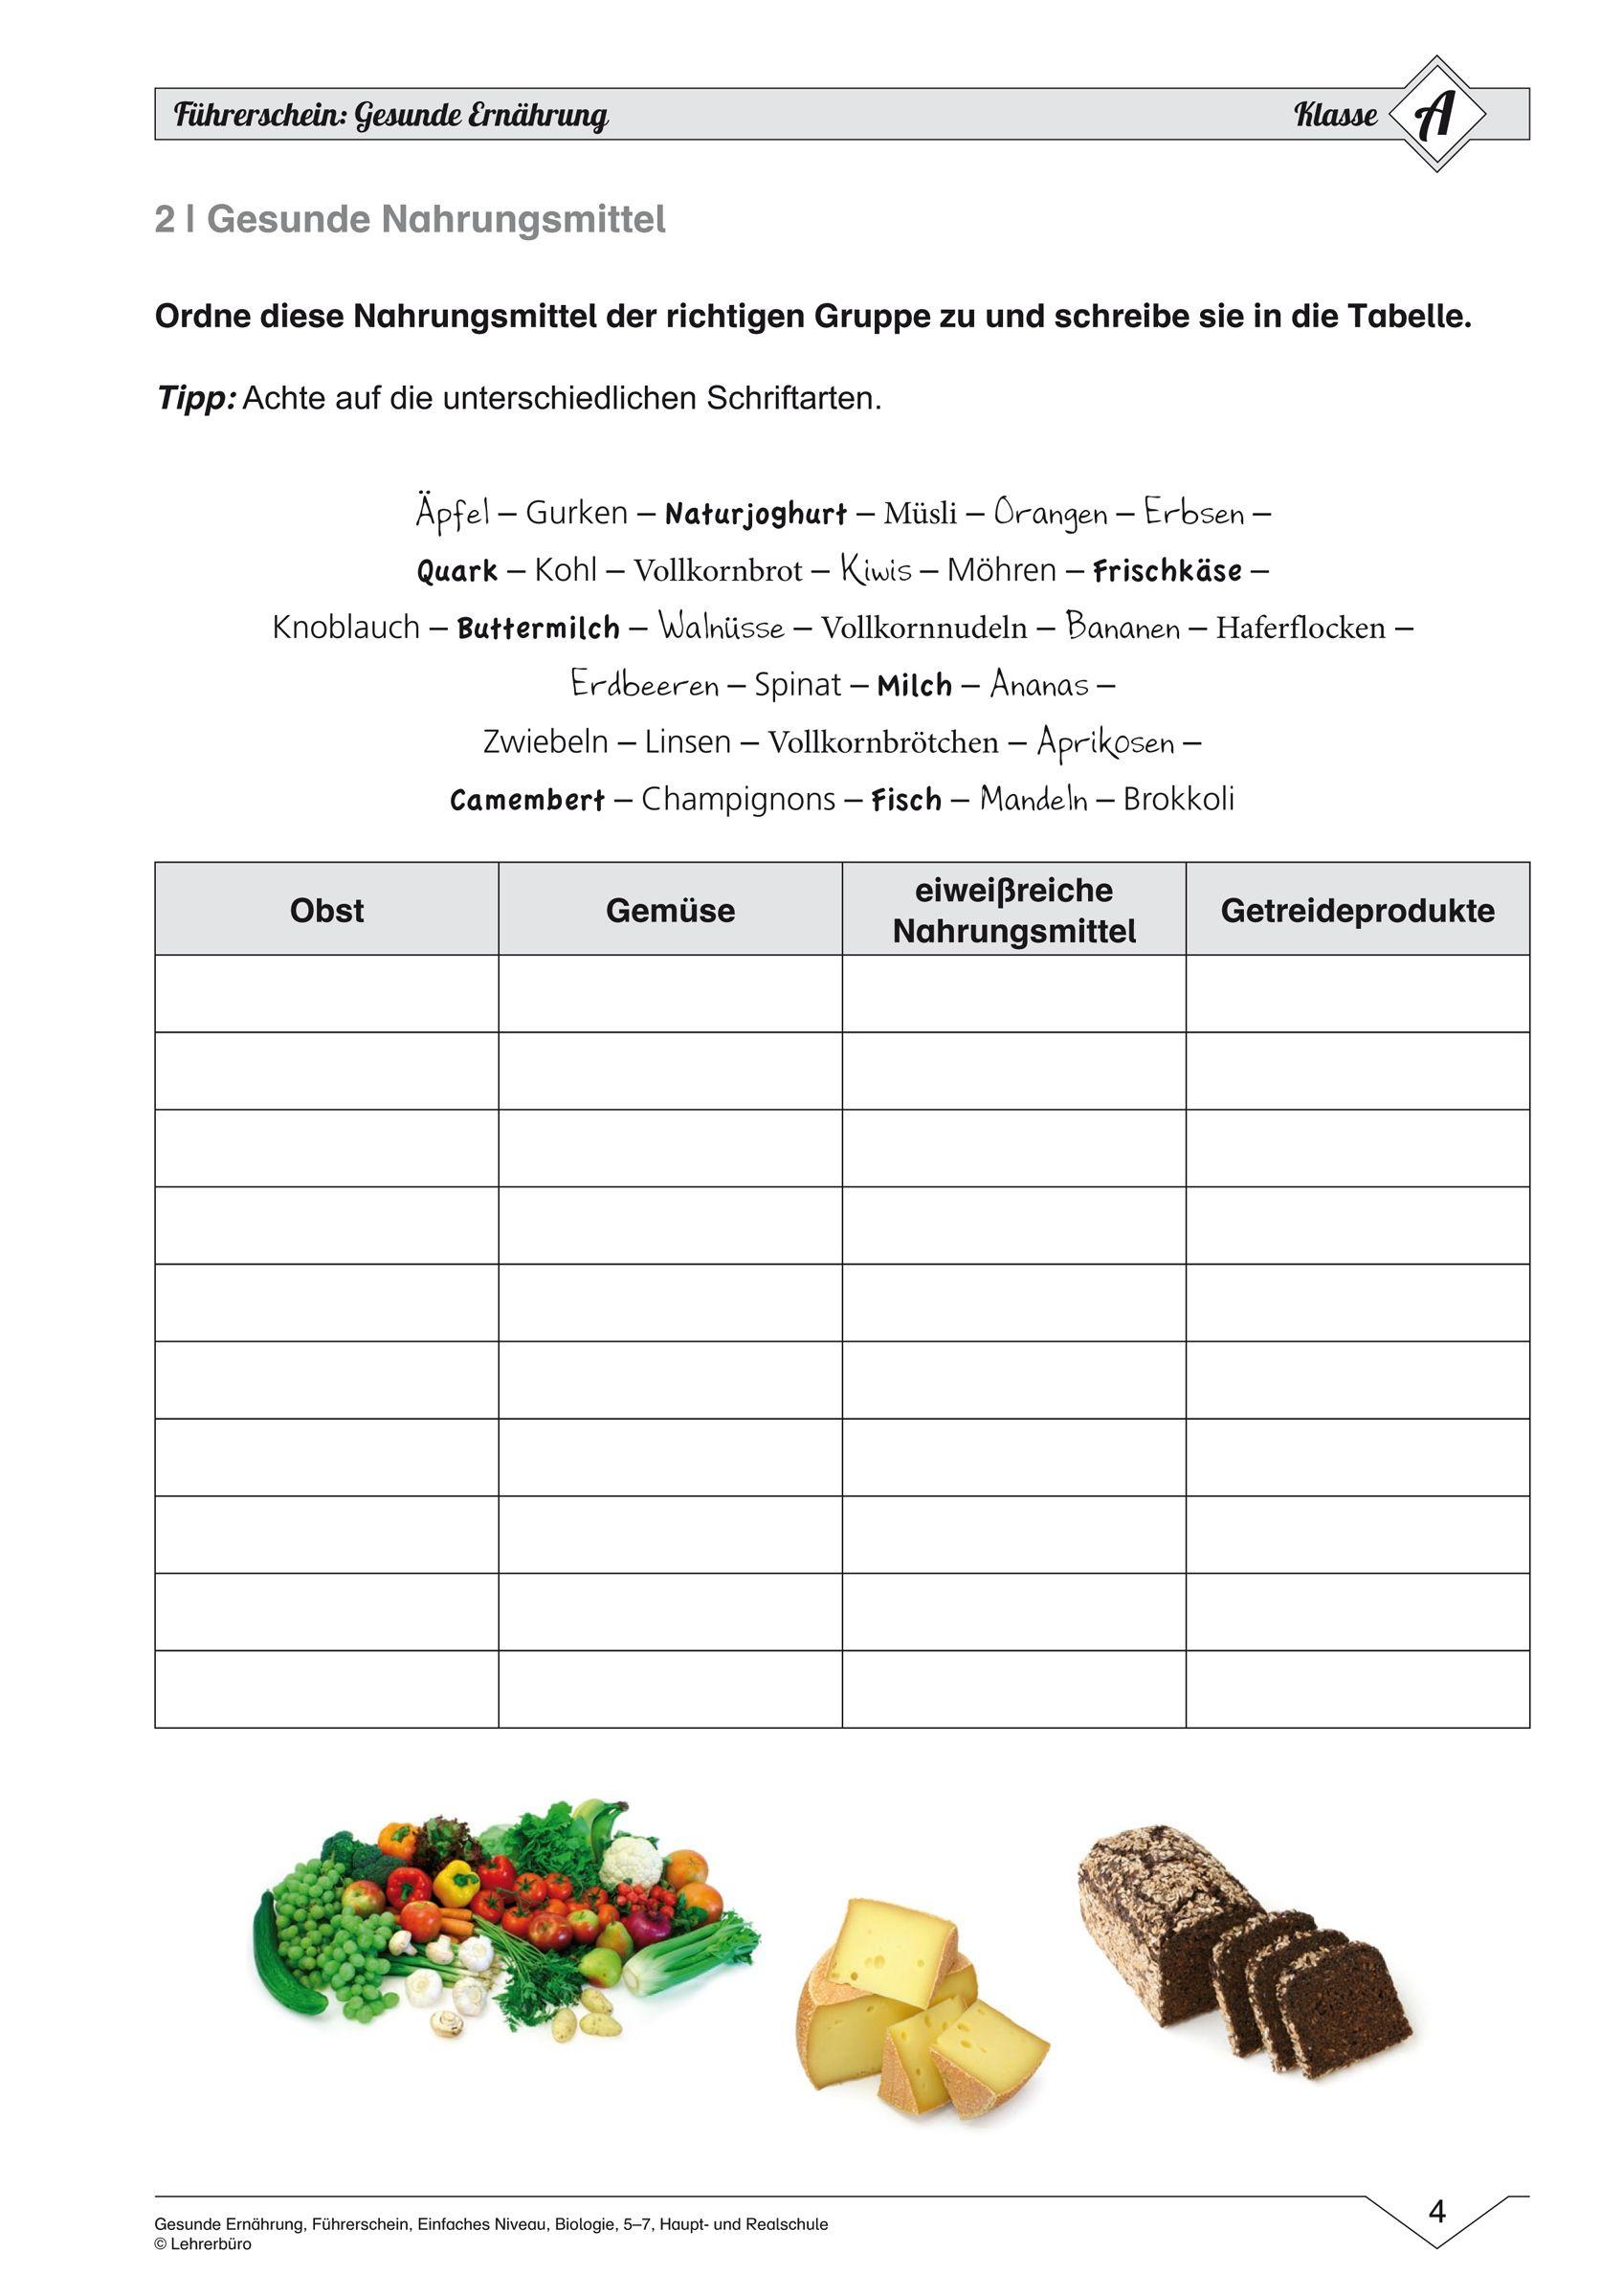 15 Arbeitsblatter Ernahrung Ernahrung Gesunde Nahrungsmittel Vollkornnudeln